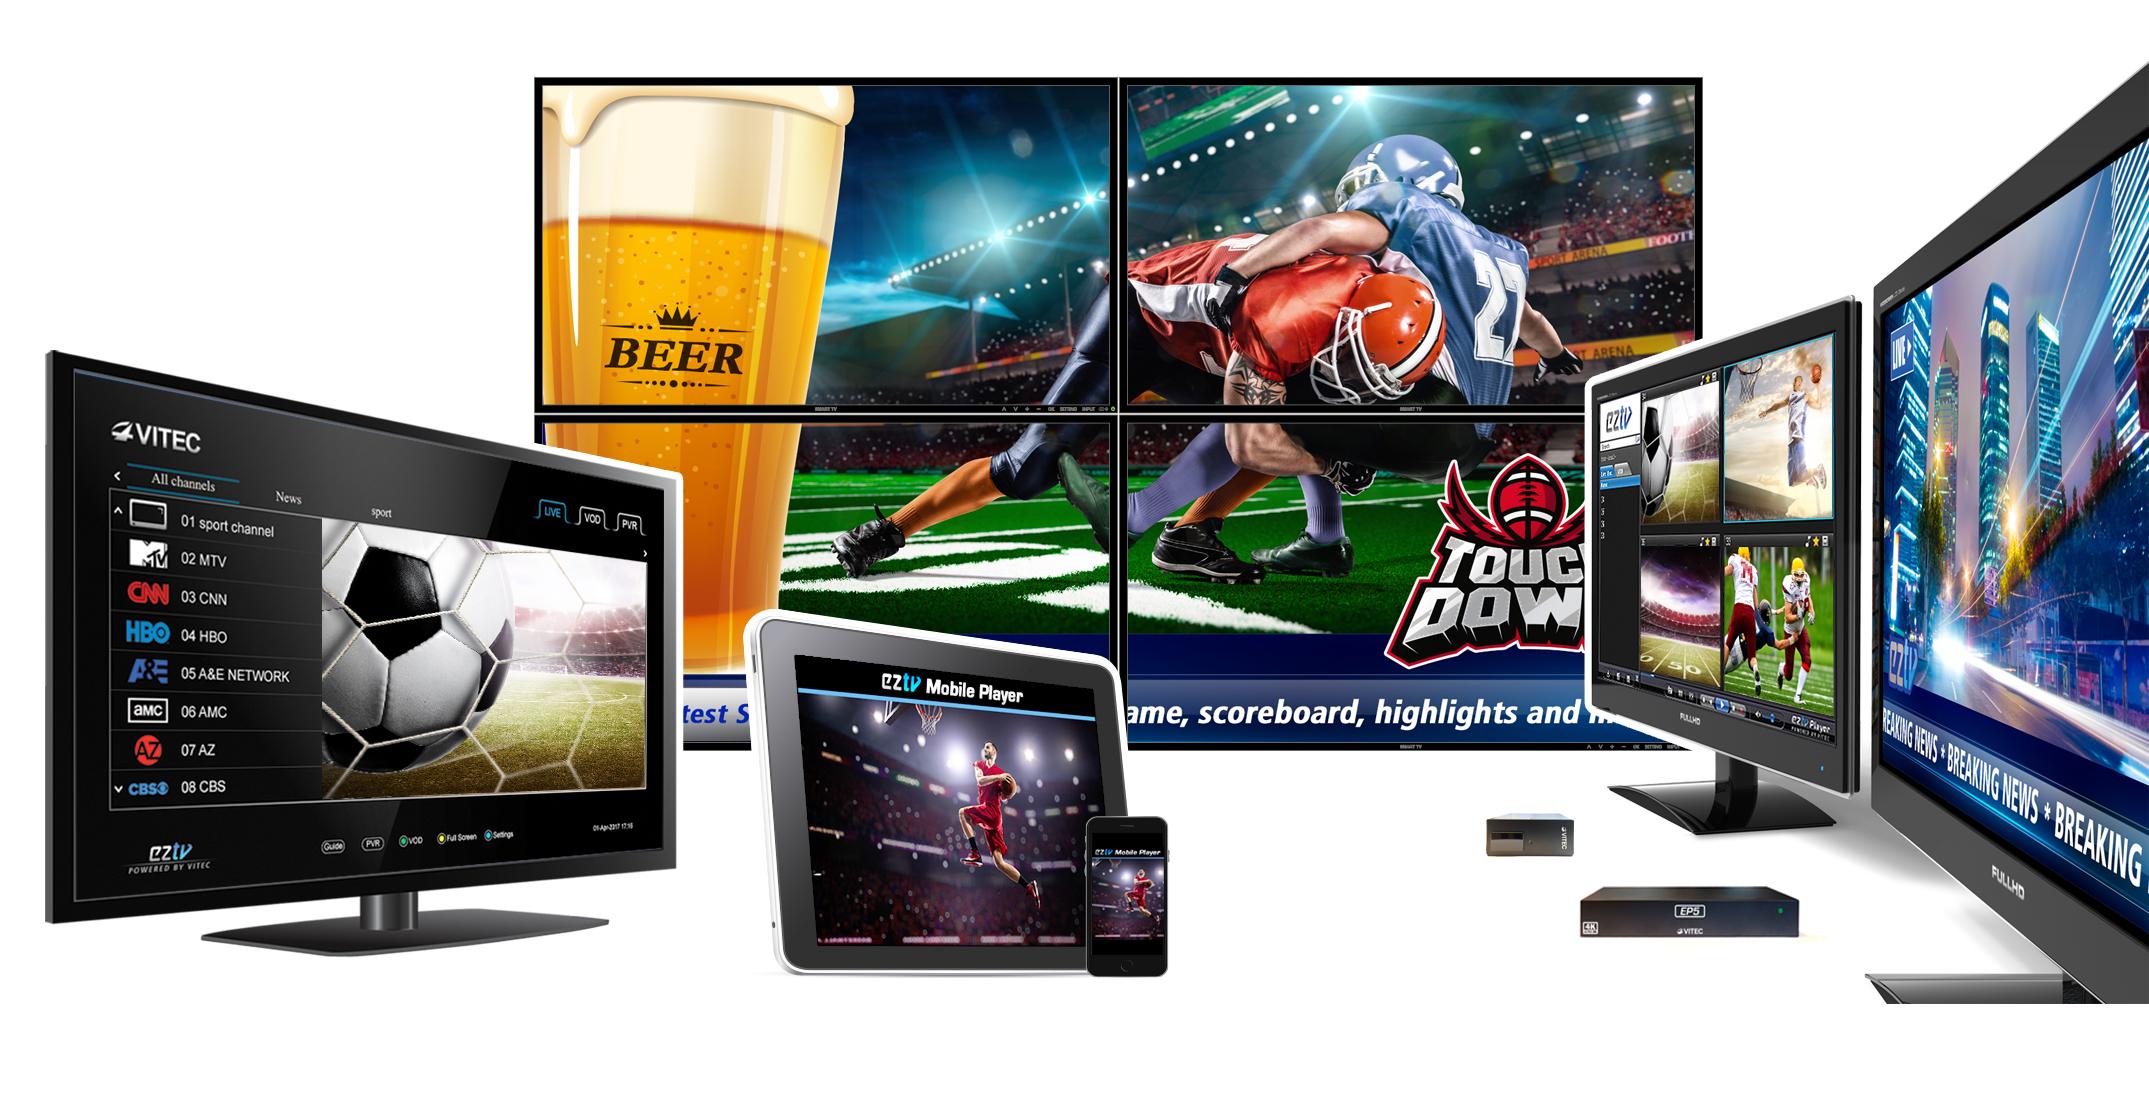 IPTV- Make your television internet platform for enjoying streaming shows